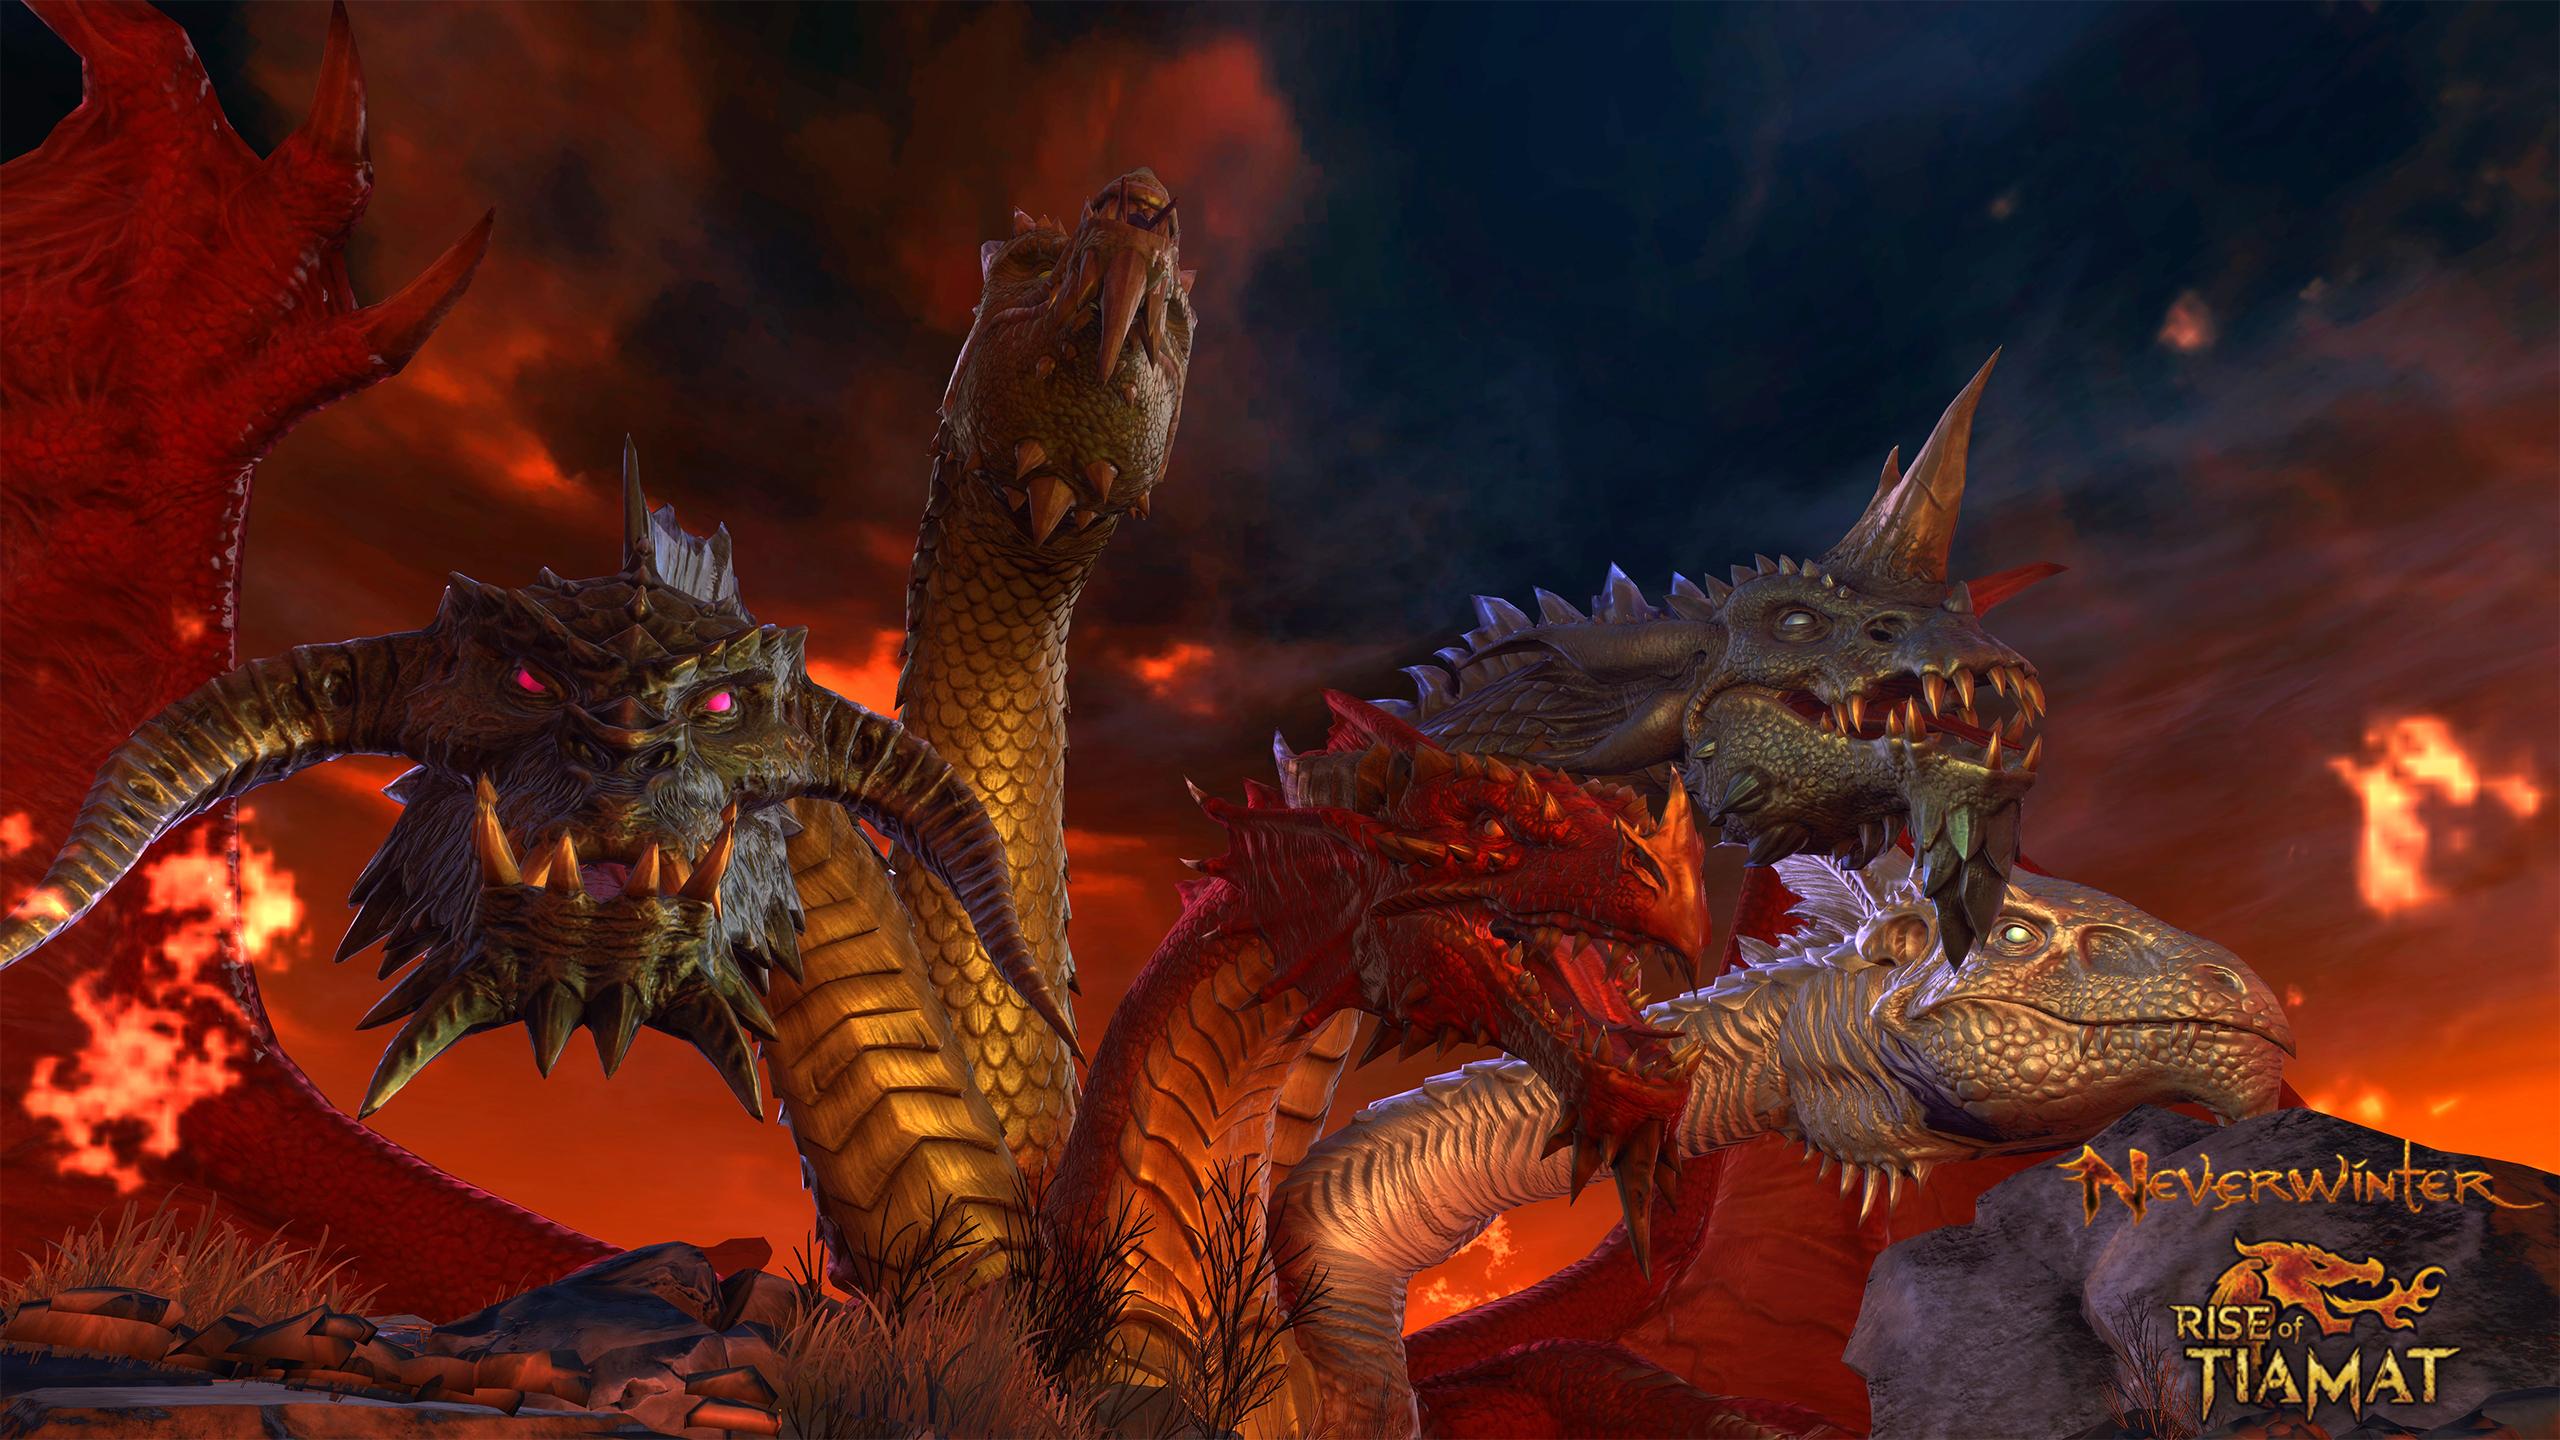 Neverwinter Rise of Tiamat screenshot